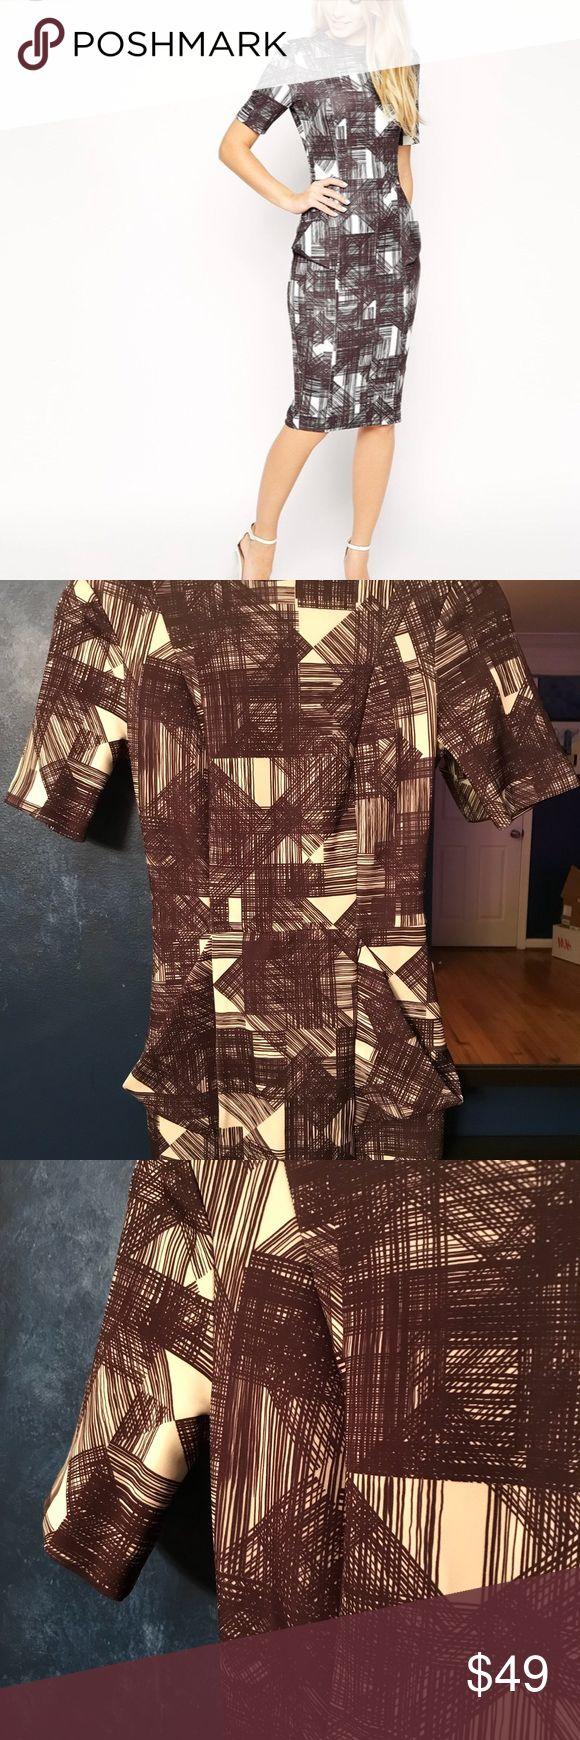 ASOS wiggle dress, new ASOS wiggle dress with gold pockets, sketchy mini print, scuba fabric ASOS Dresses Midi